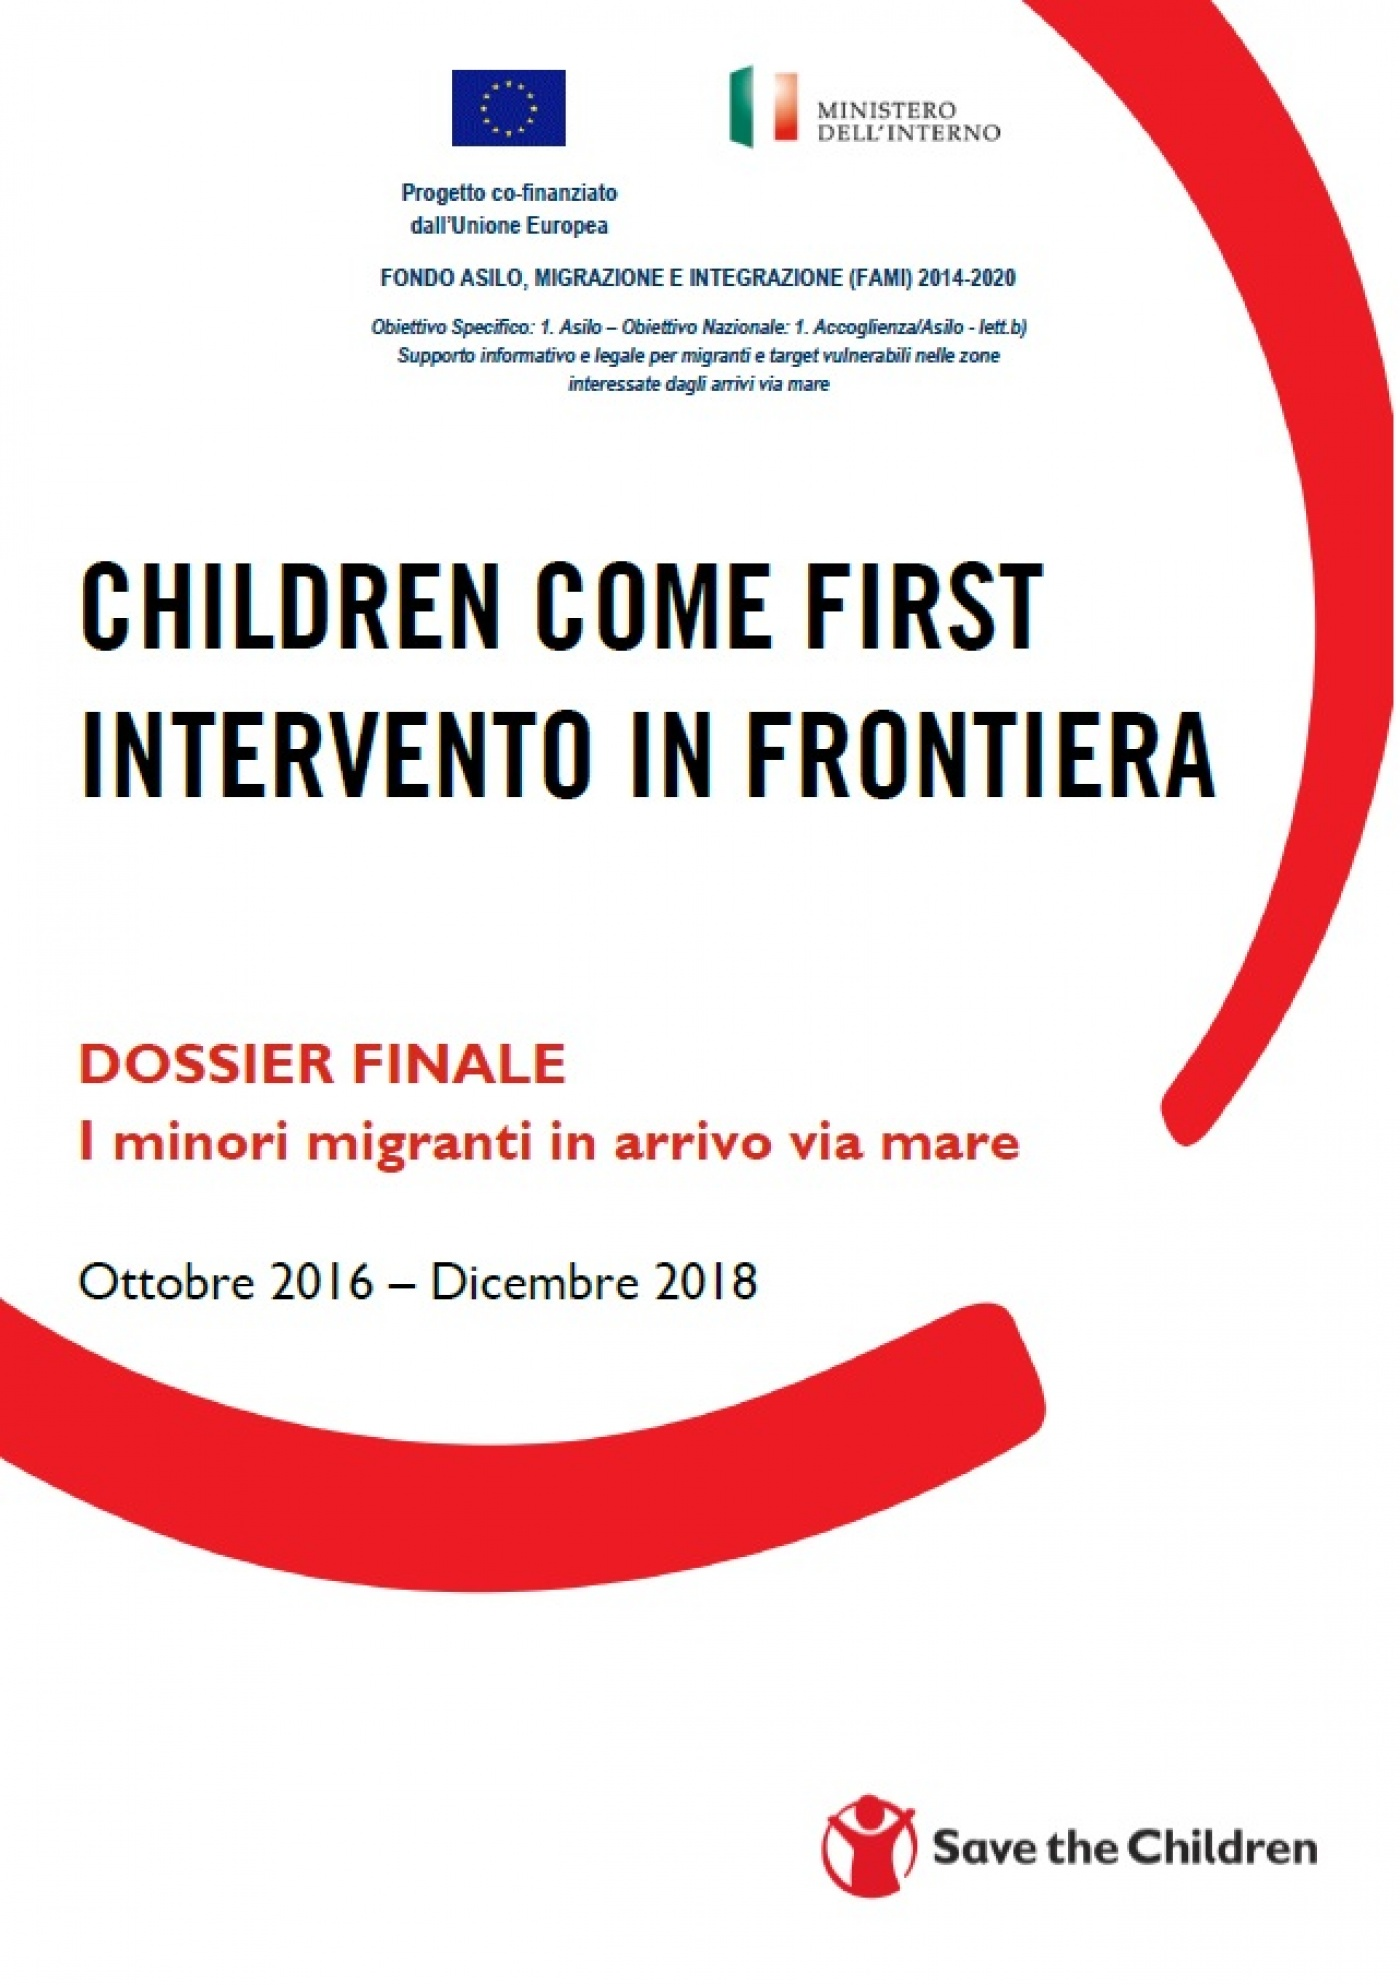 copertina_report_children_come_first